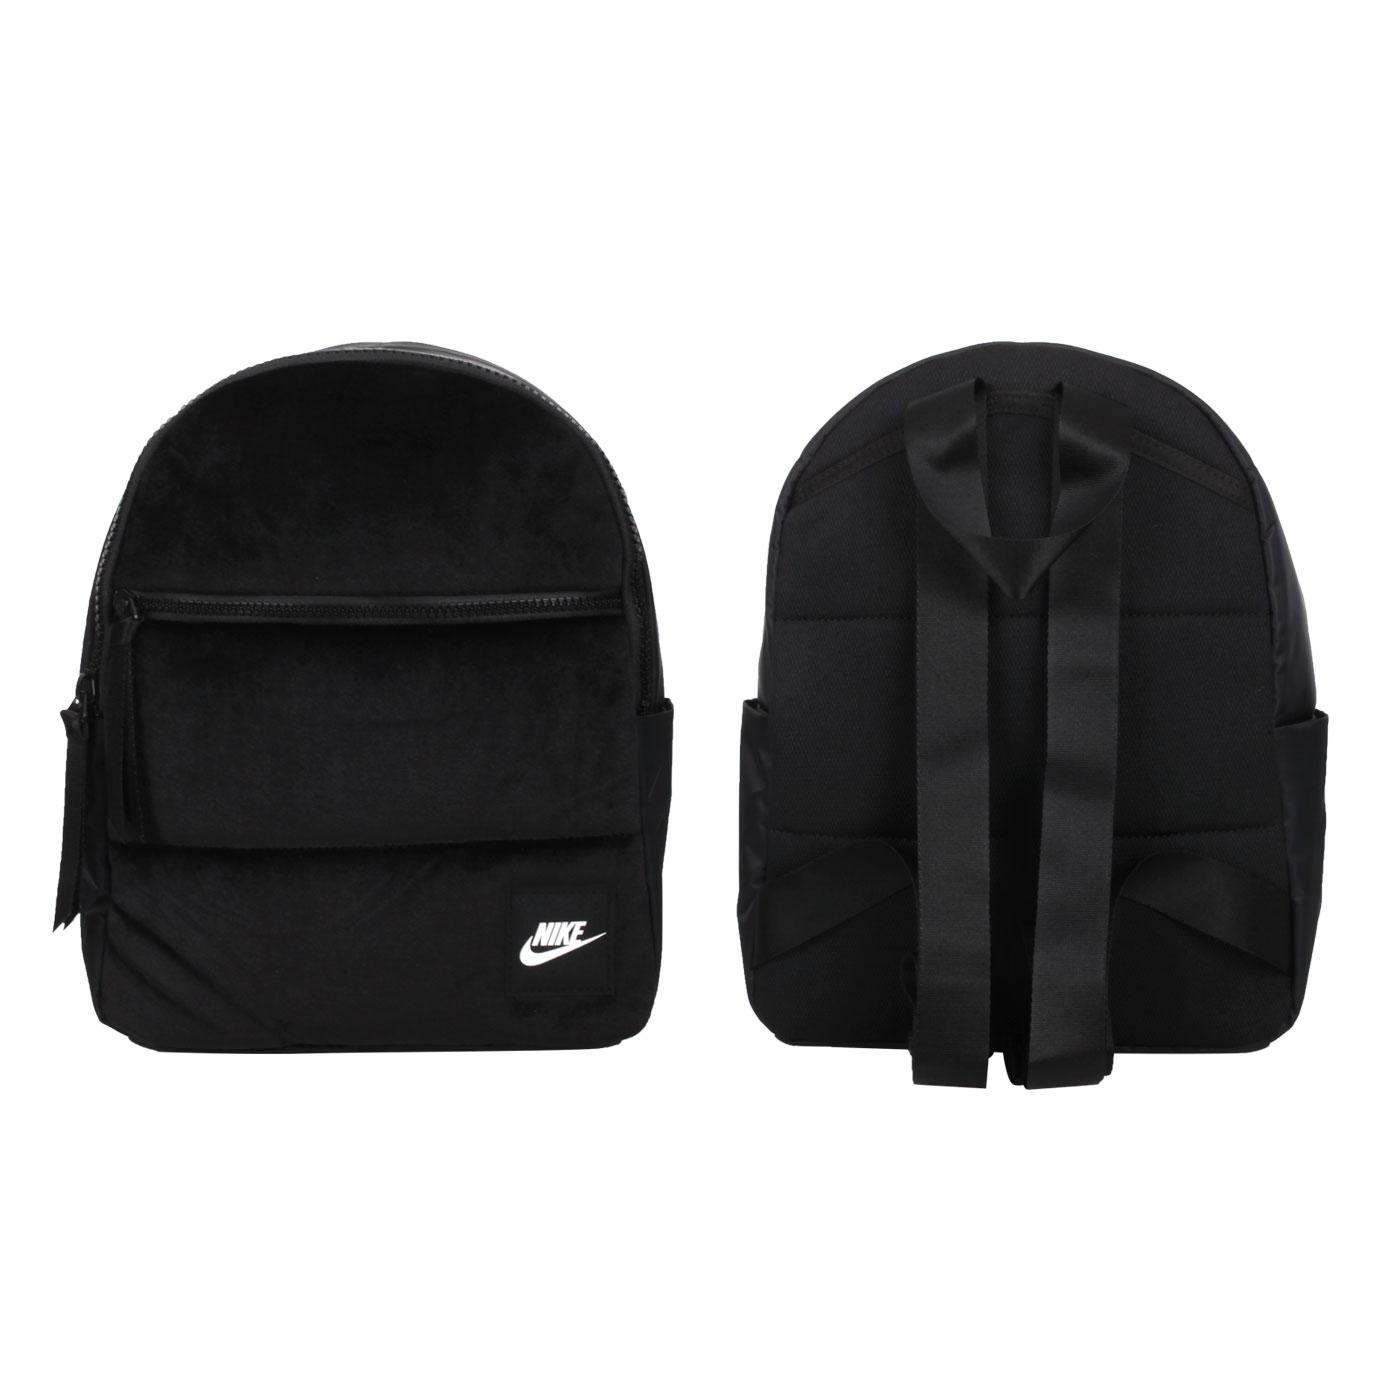 NIKE 小型後背包 CU2574-010 - 黑白